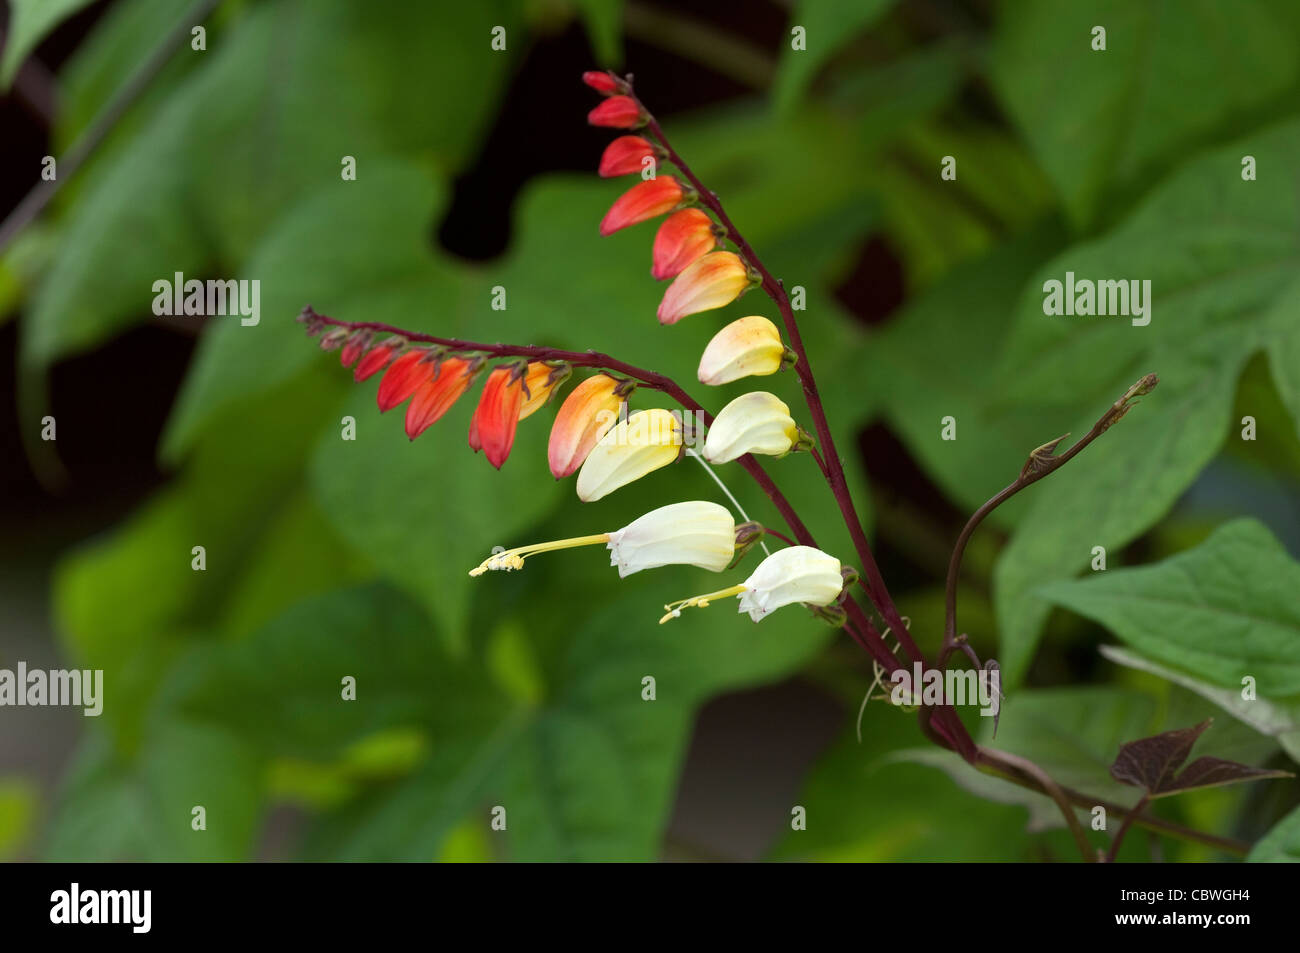 Fire Vine (Ipomoea lobata, Quamoclit lobata), flowers. - Stock Image